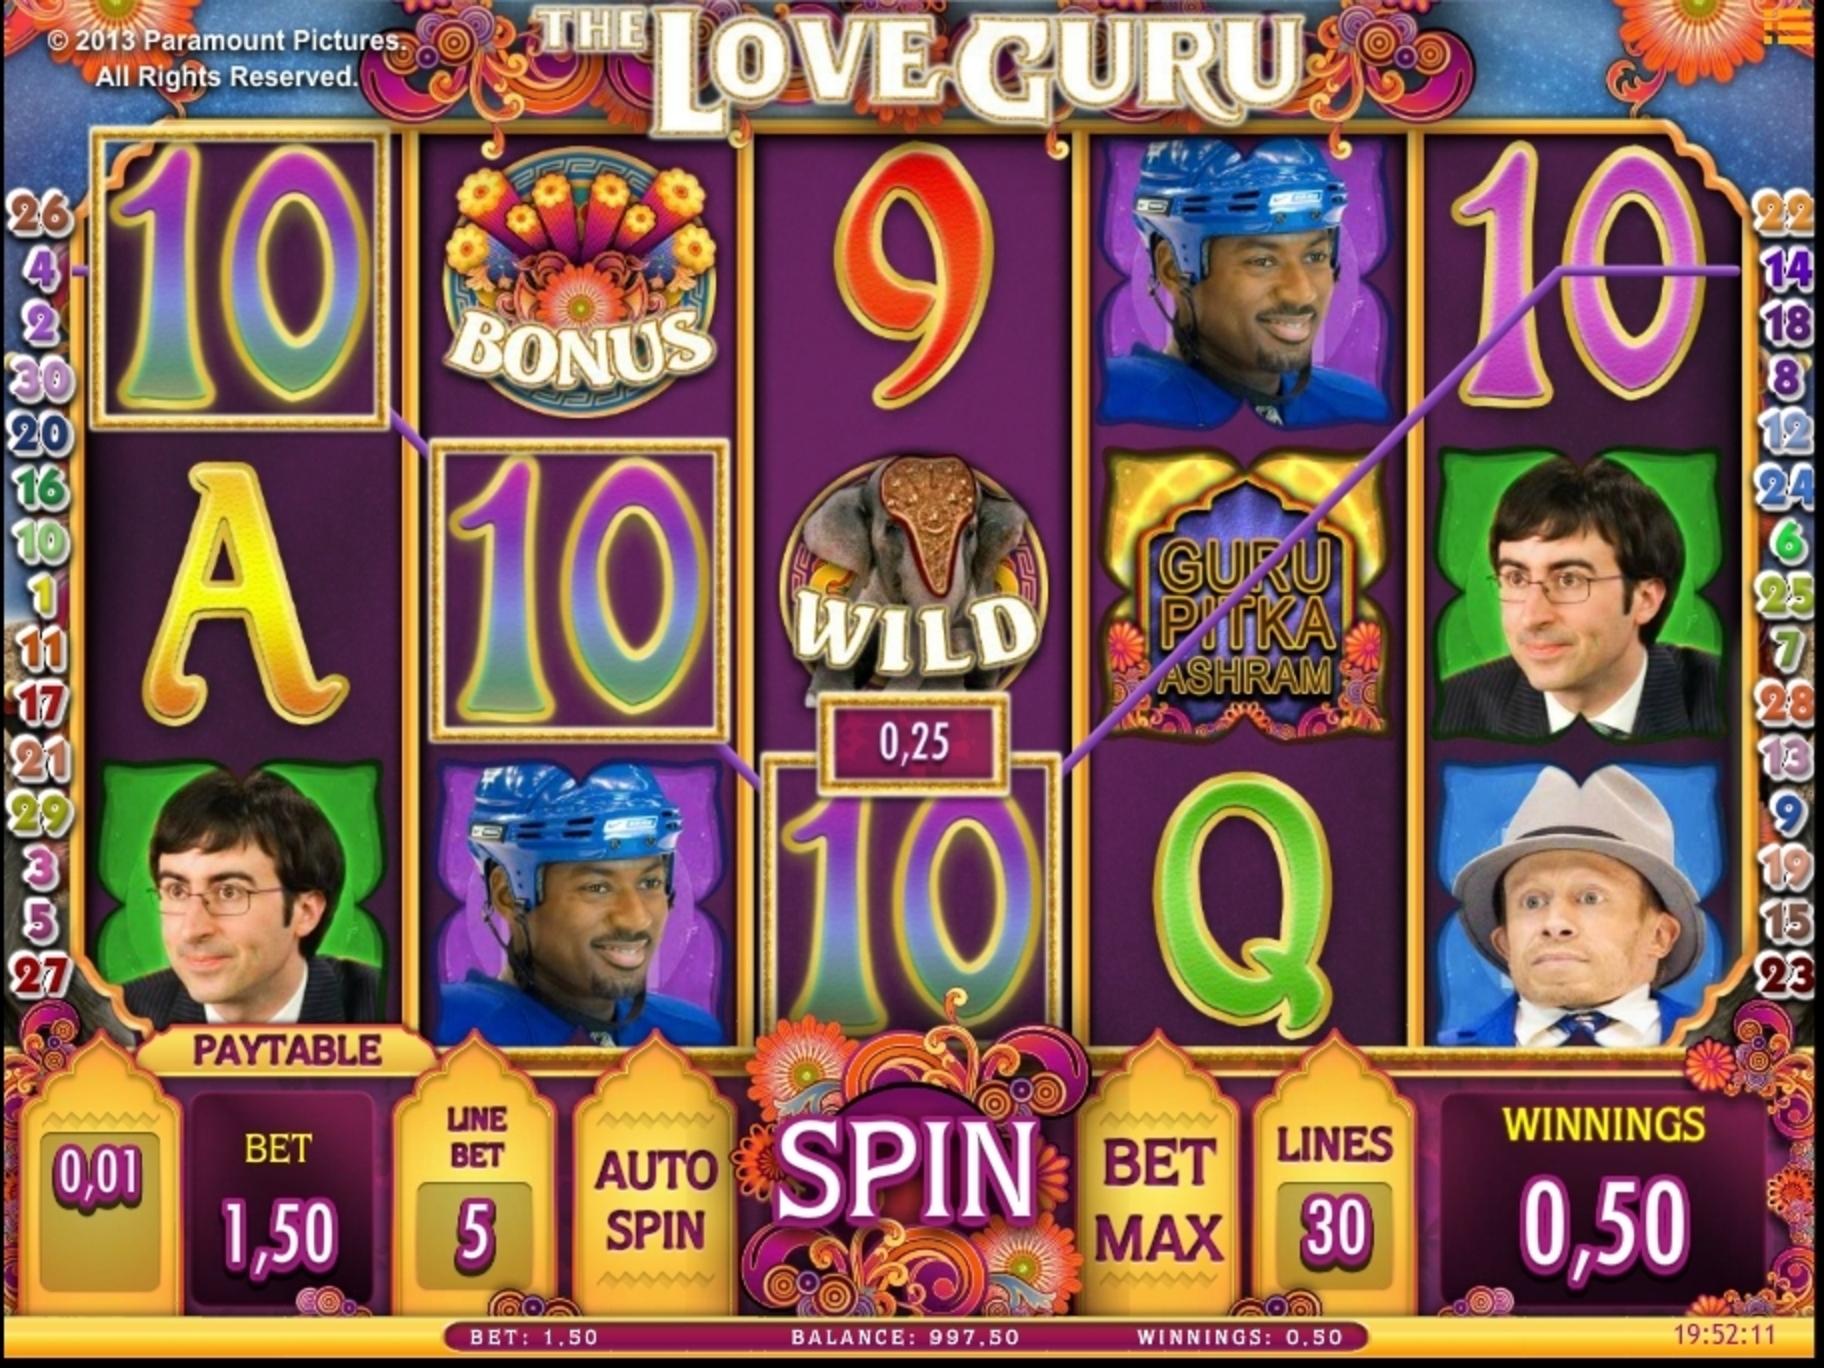 The Love Guru Slot Machine